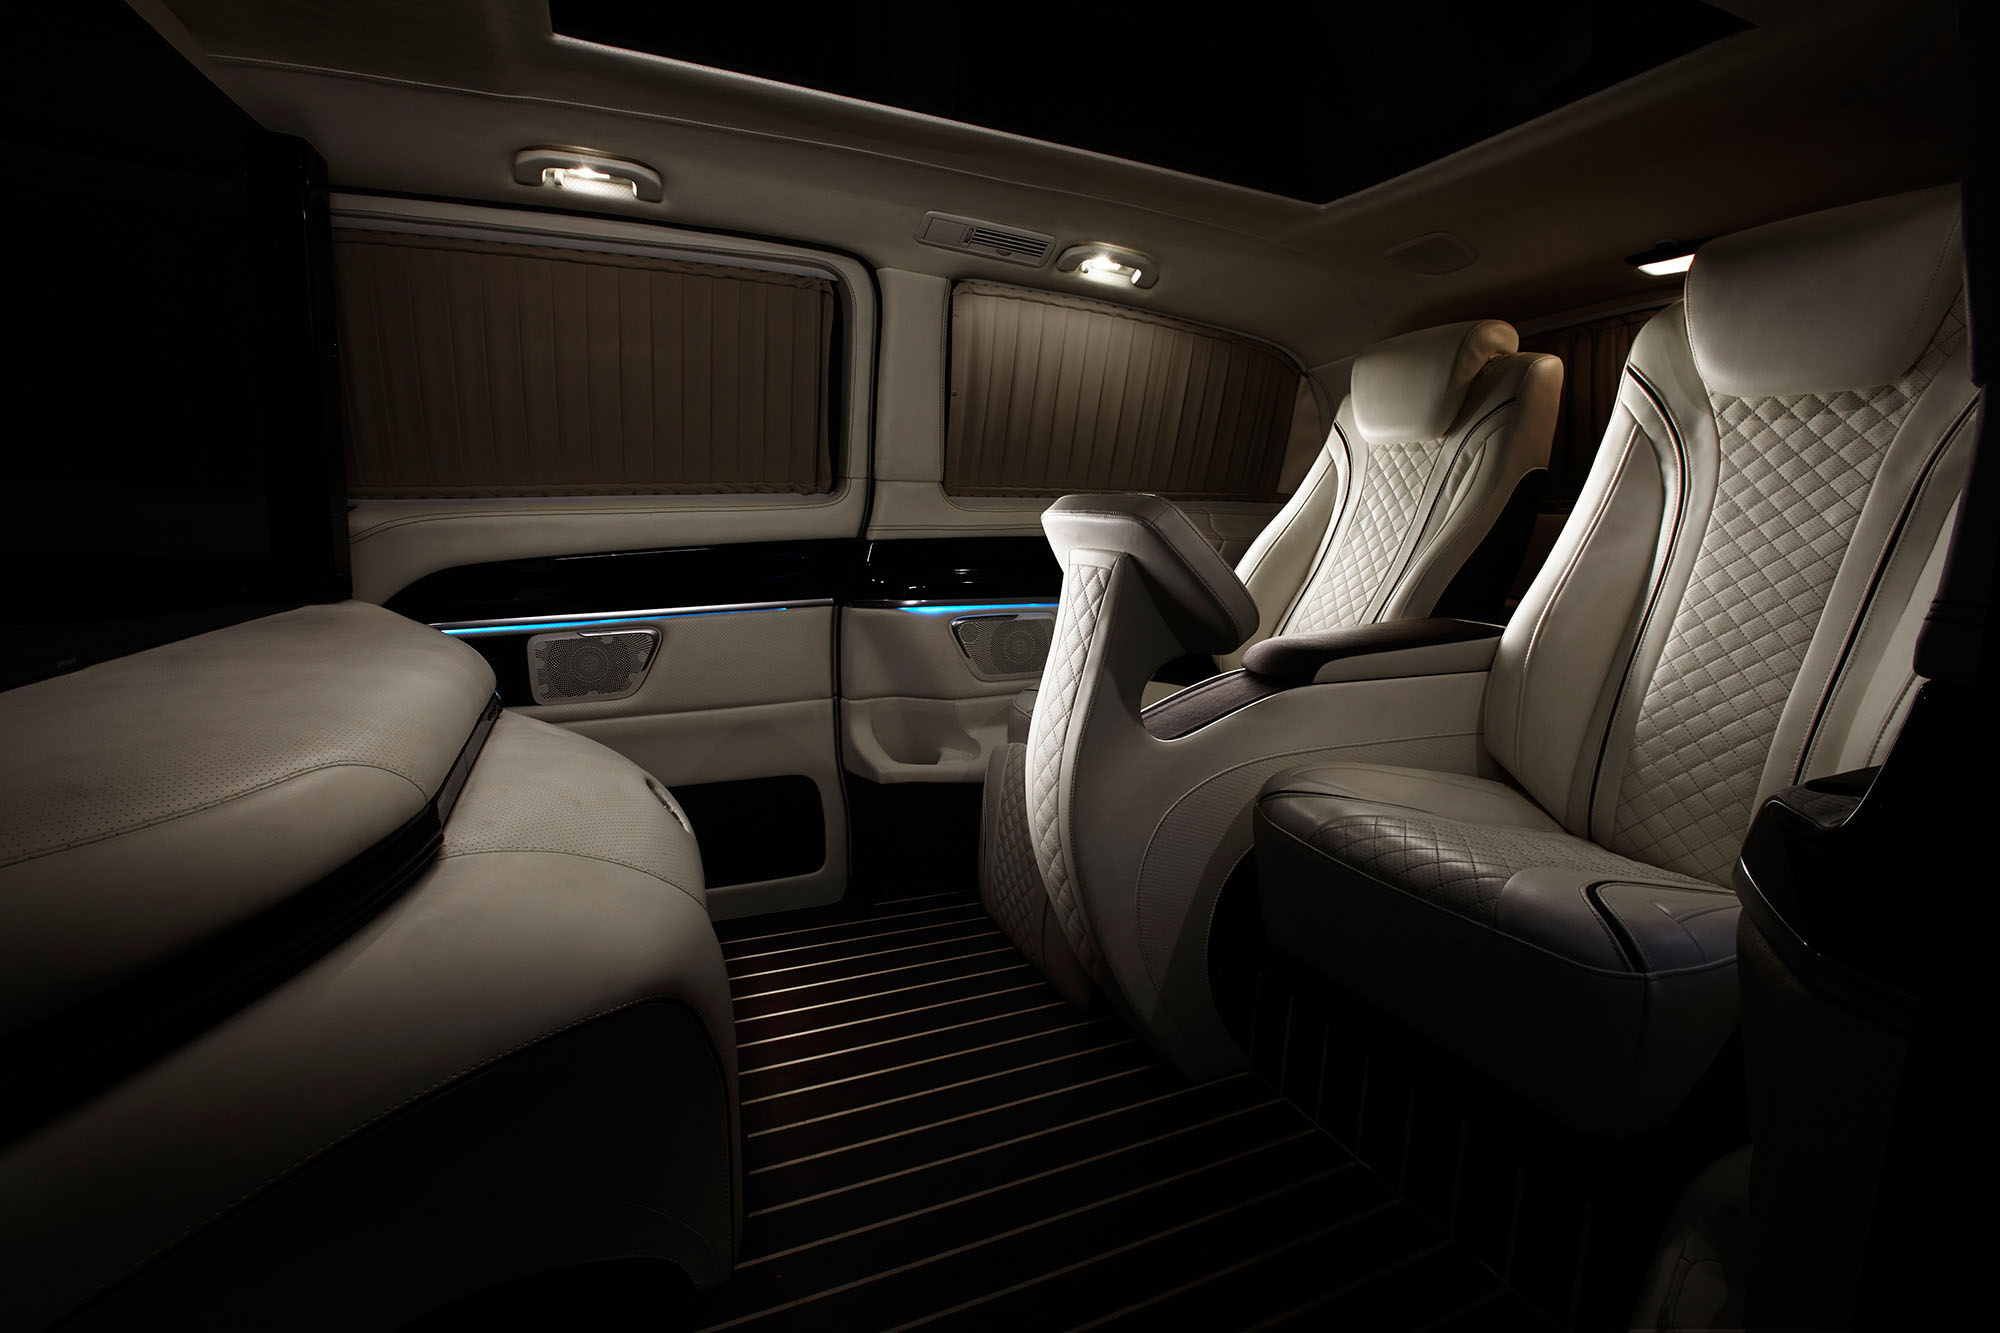 New Mercedes-Benz midsize commercial van to be named Metris